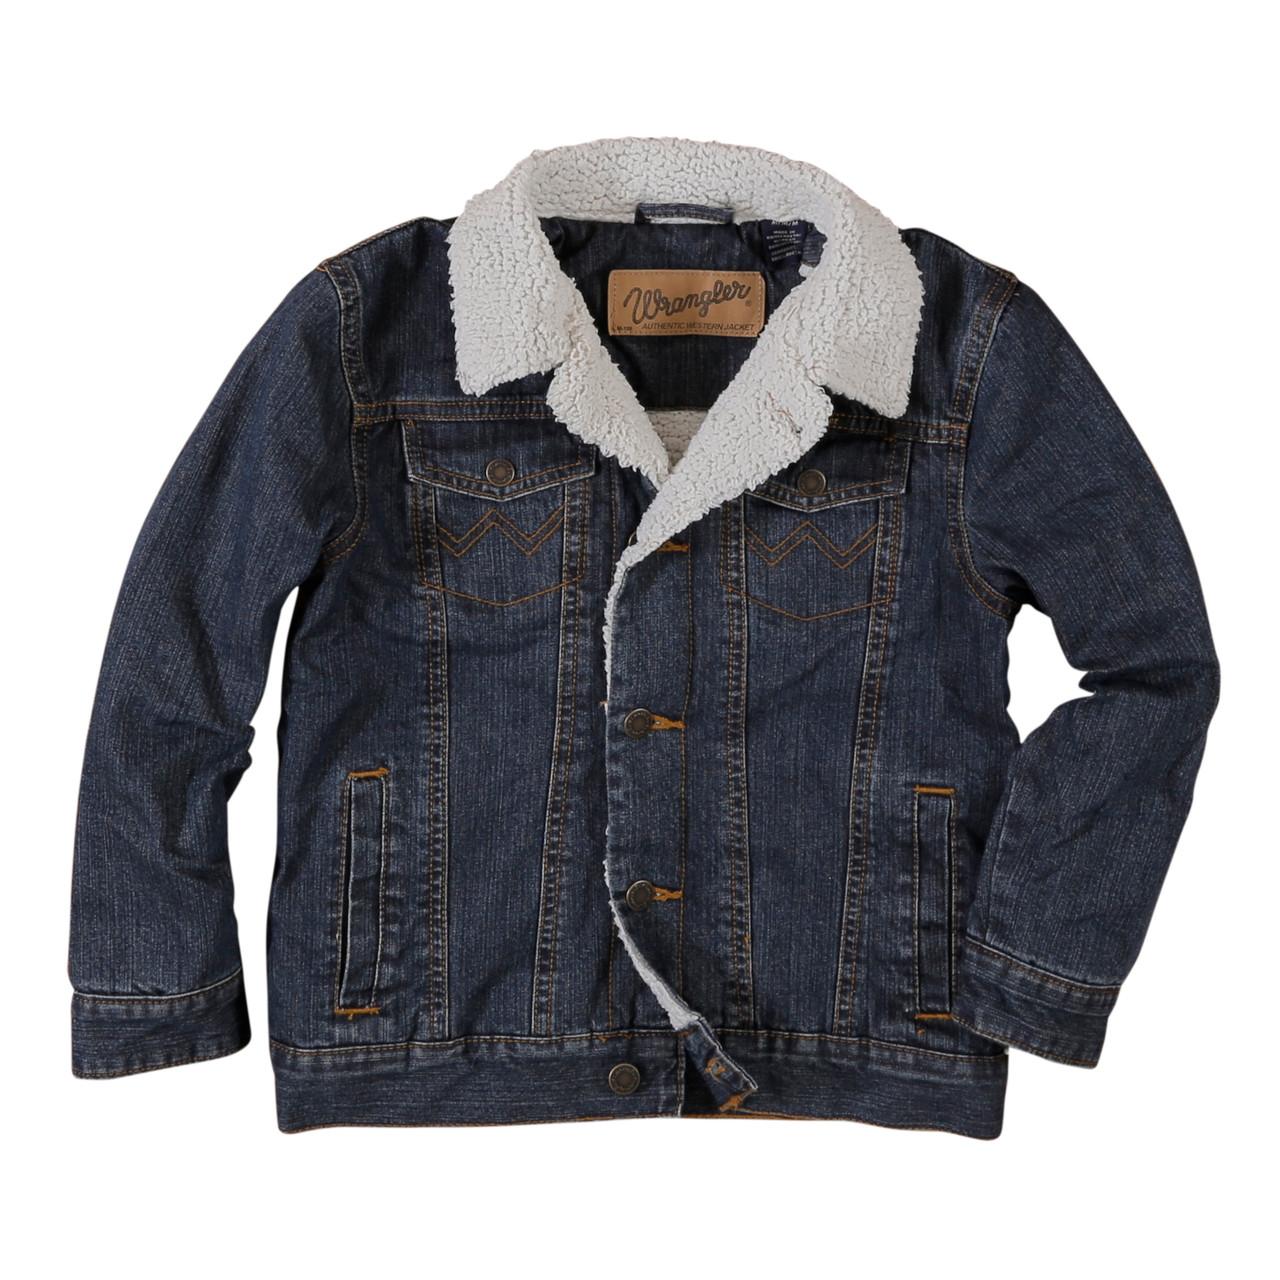 Wrangler Boys Lined Denim Jacket Denim Jacket